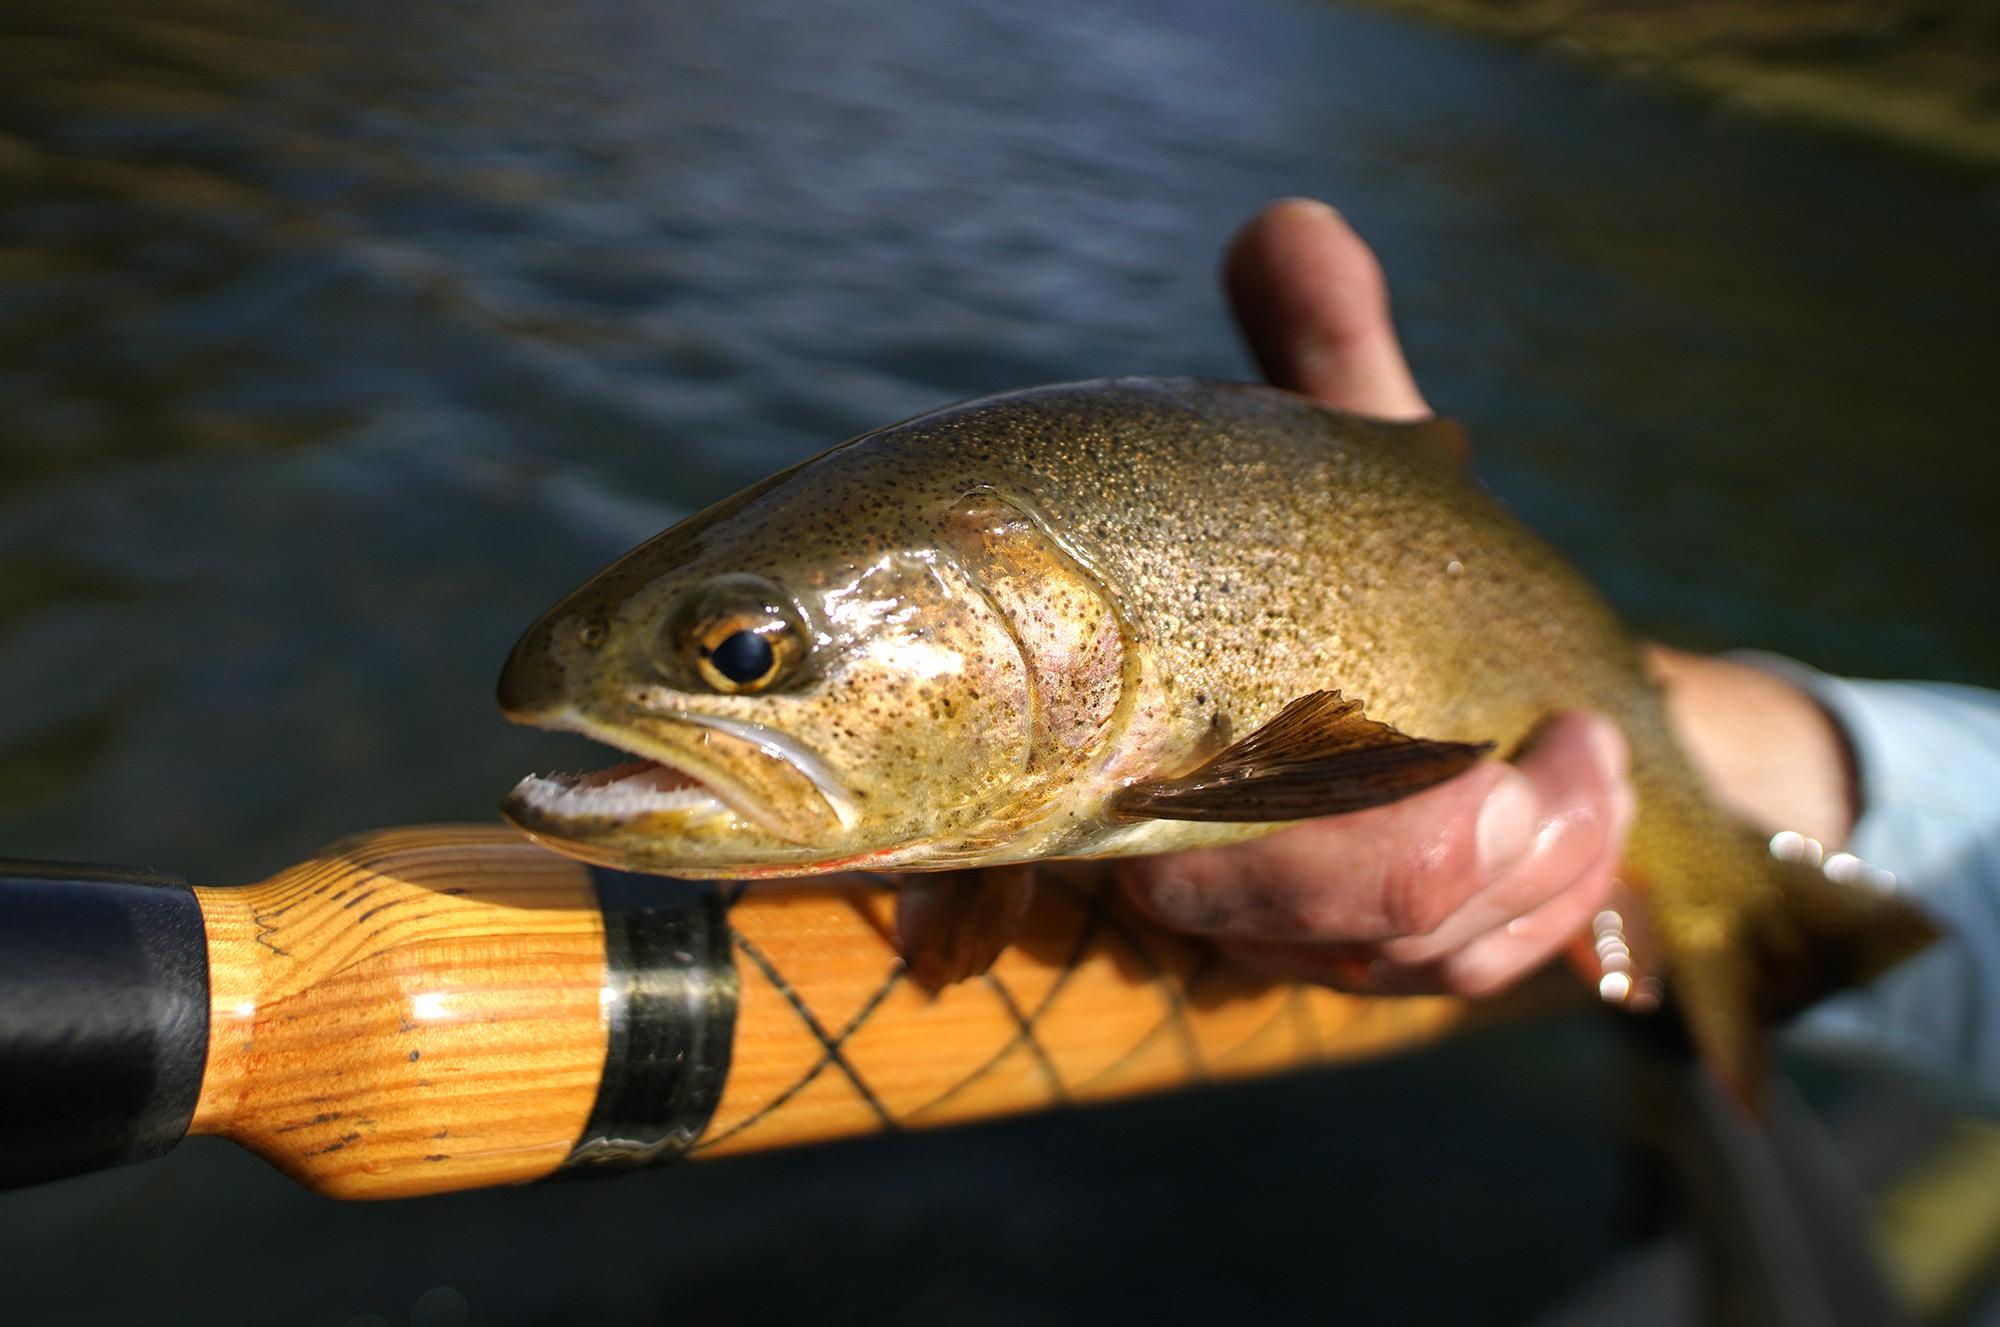 Teton river cutthroat